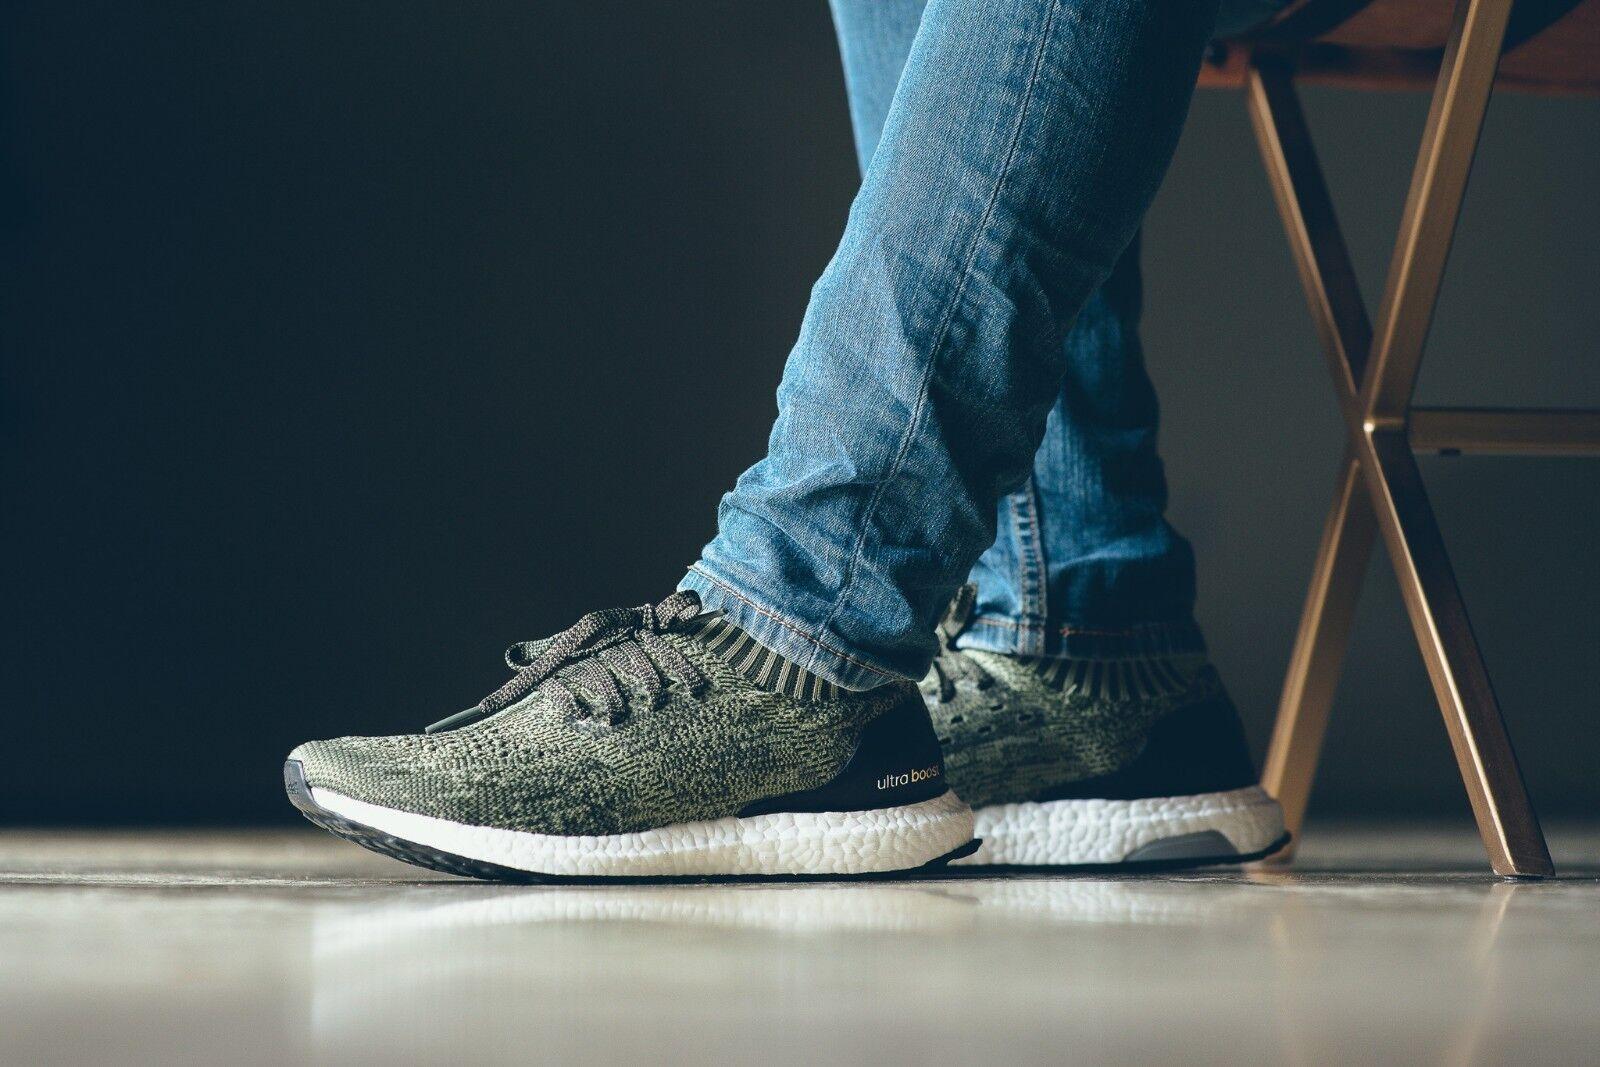 Adidas ultra impulso senza freni tech oliva.bb3901.nmd terra numero 13.verde oliva.bb3901.nmd tech 03b4f3